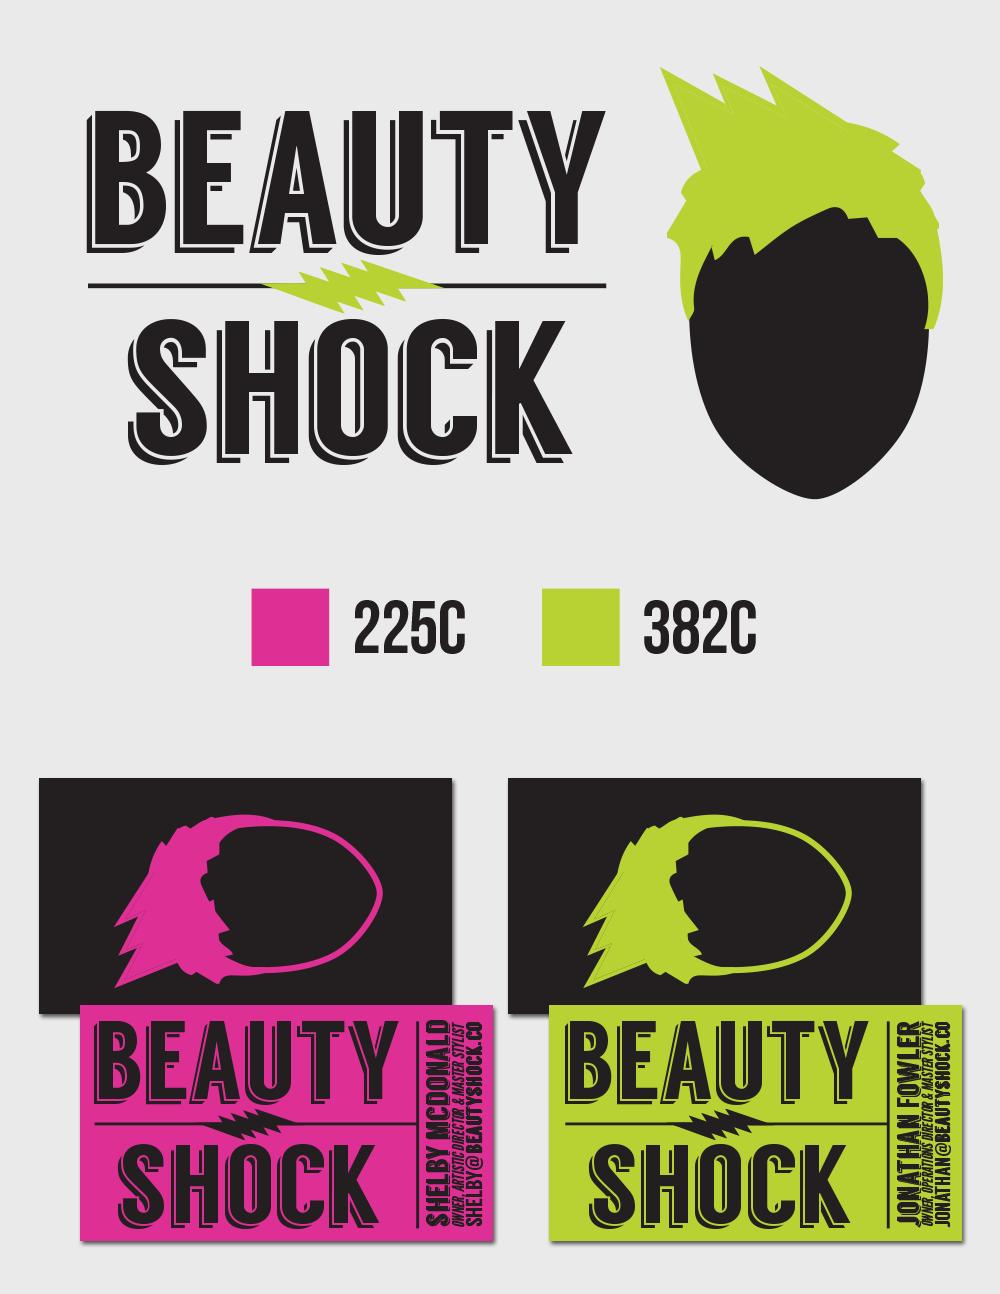 beautyshock branding